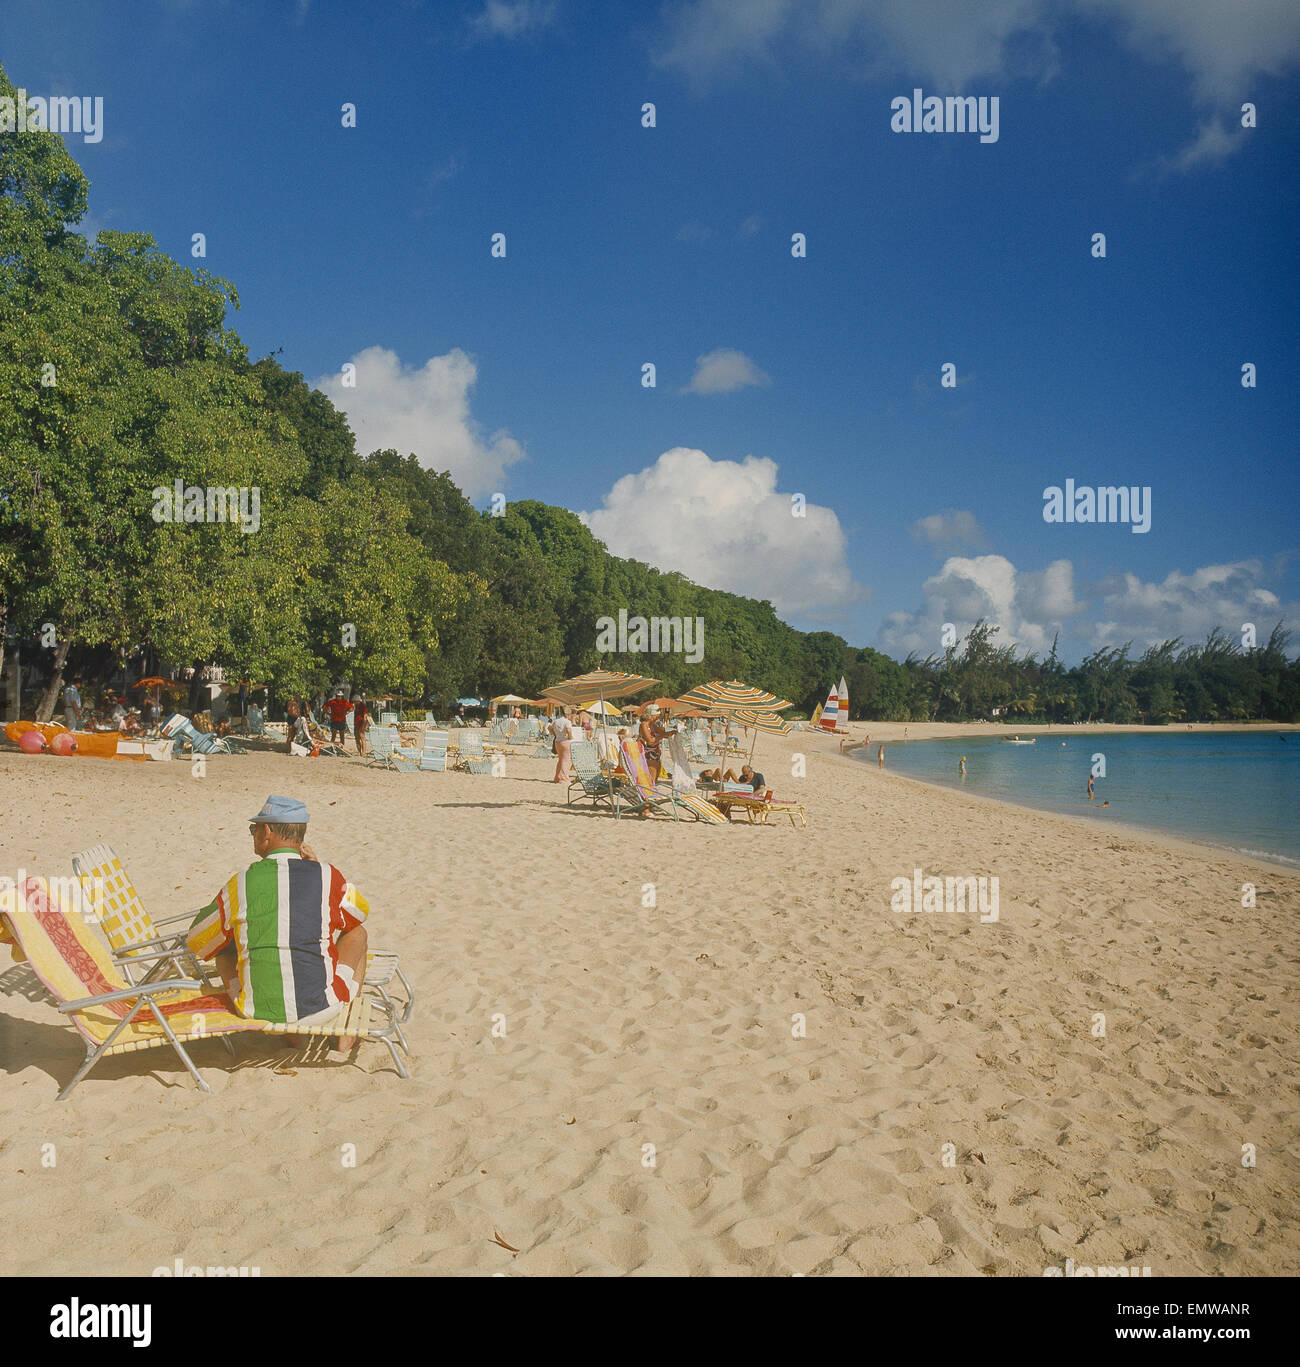 Kl-Antillen, Karibik, Insel Barbados, Strang Stockbild